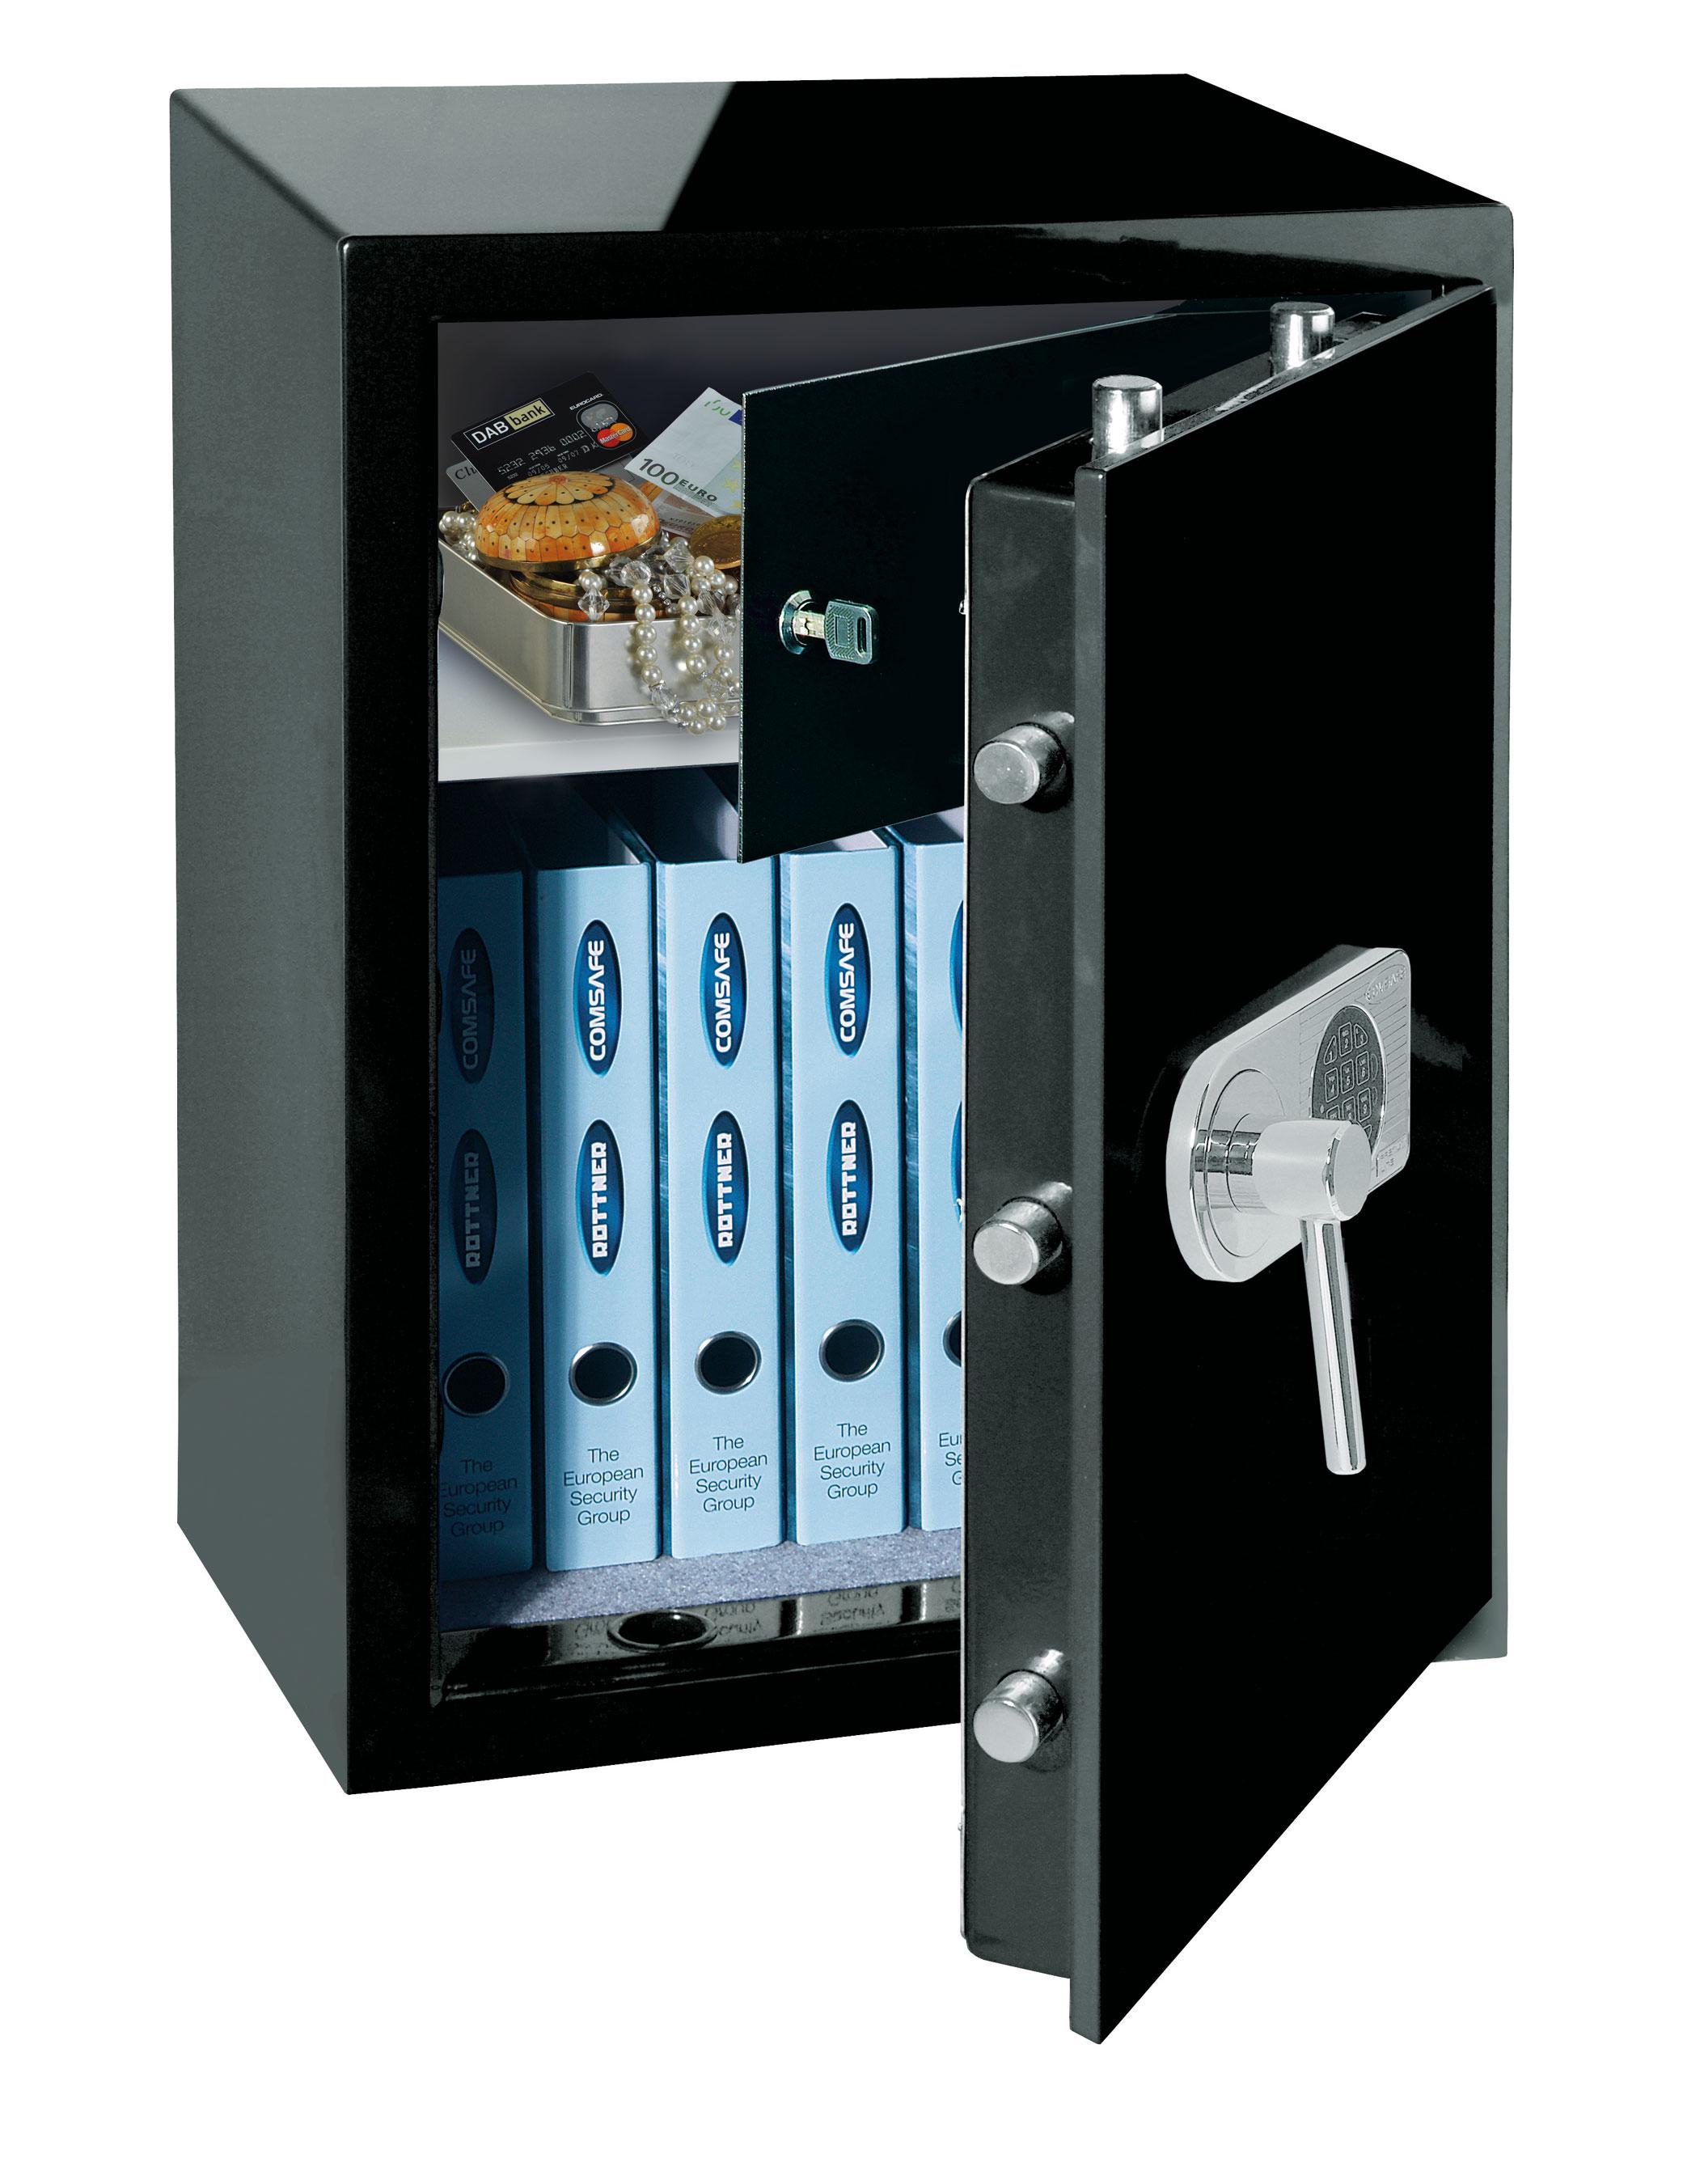 Rottner Tresor / Wertschutzschrank Design schwarz 66x49x41cm EN 1 Bild 1